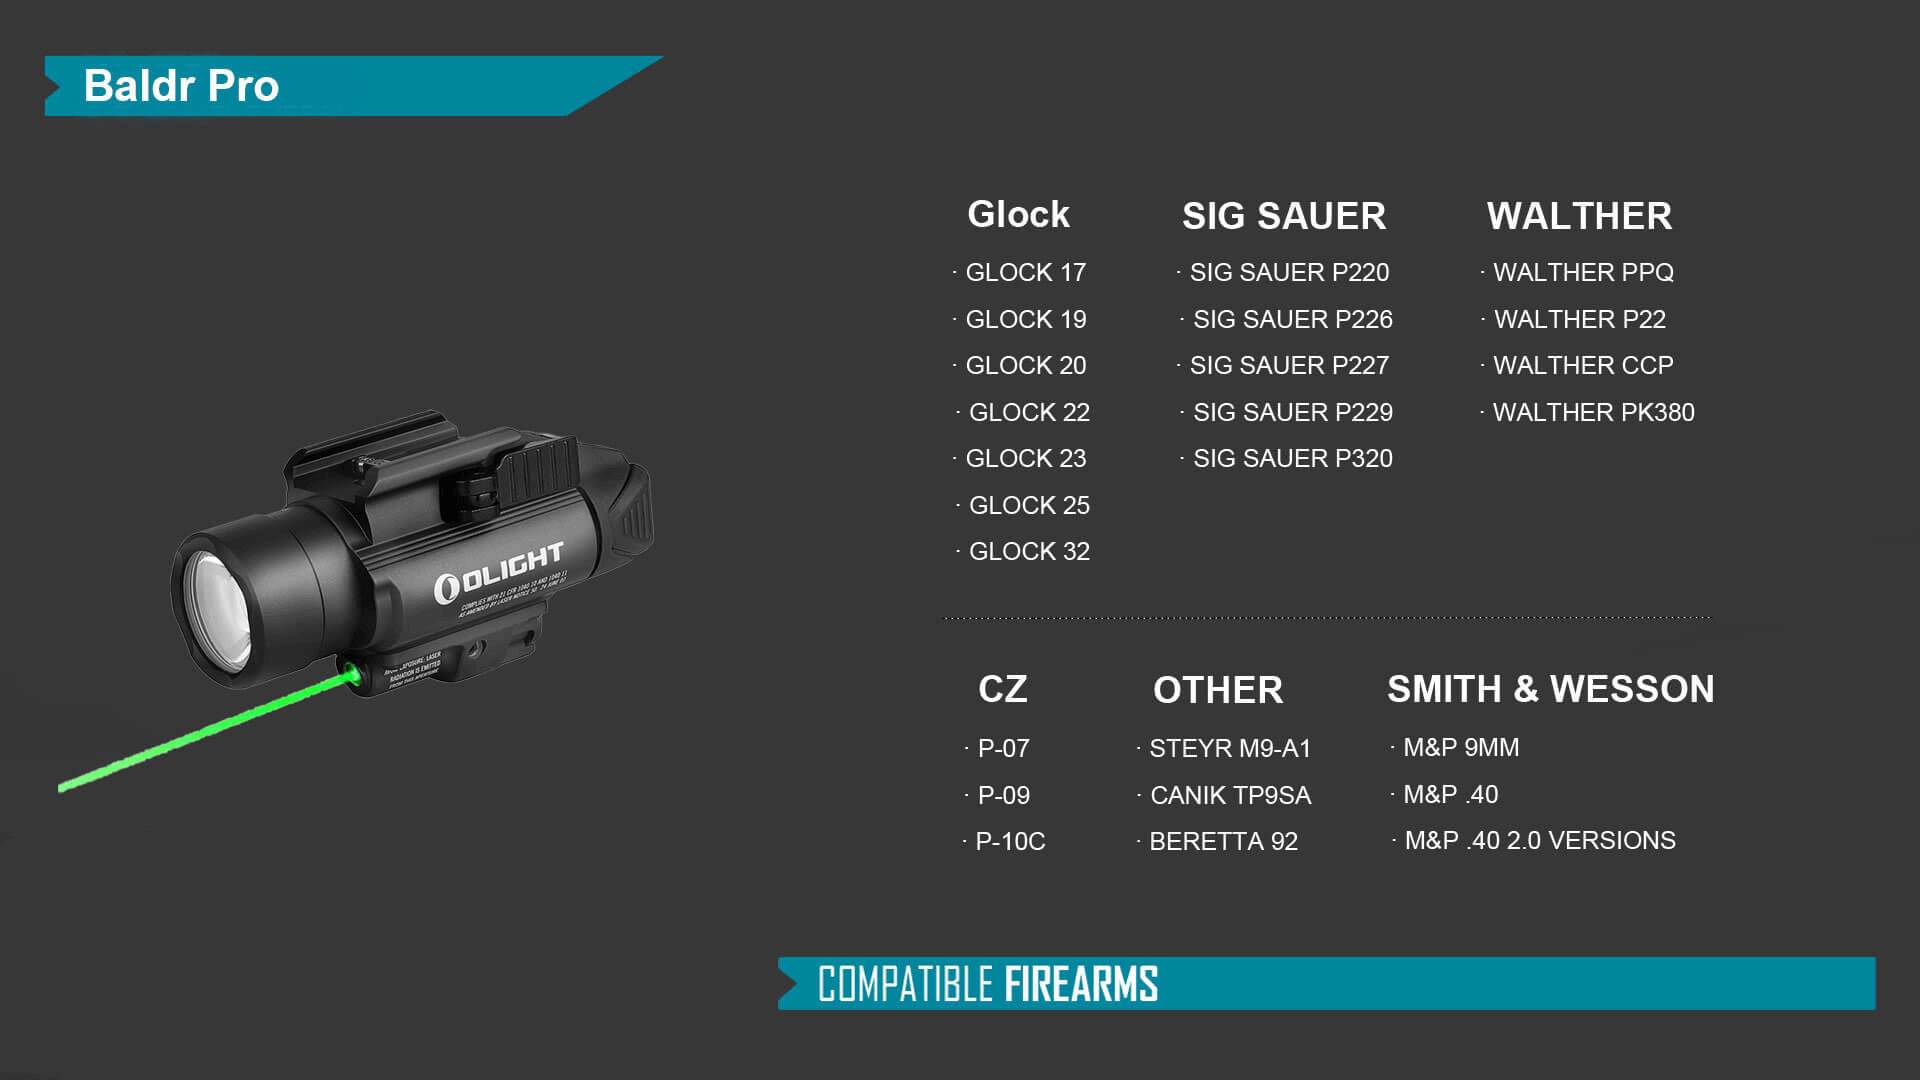 baldr-pro-kompatible-Pistolen